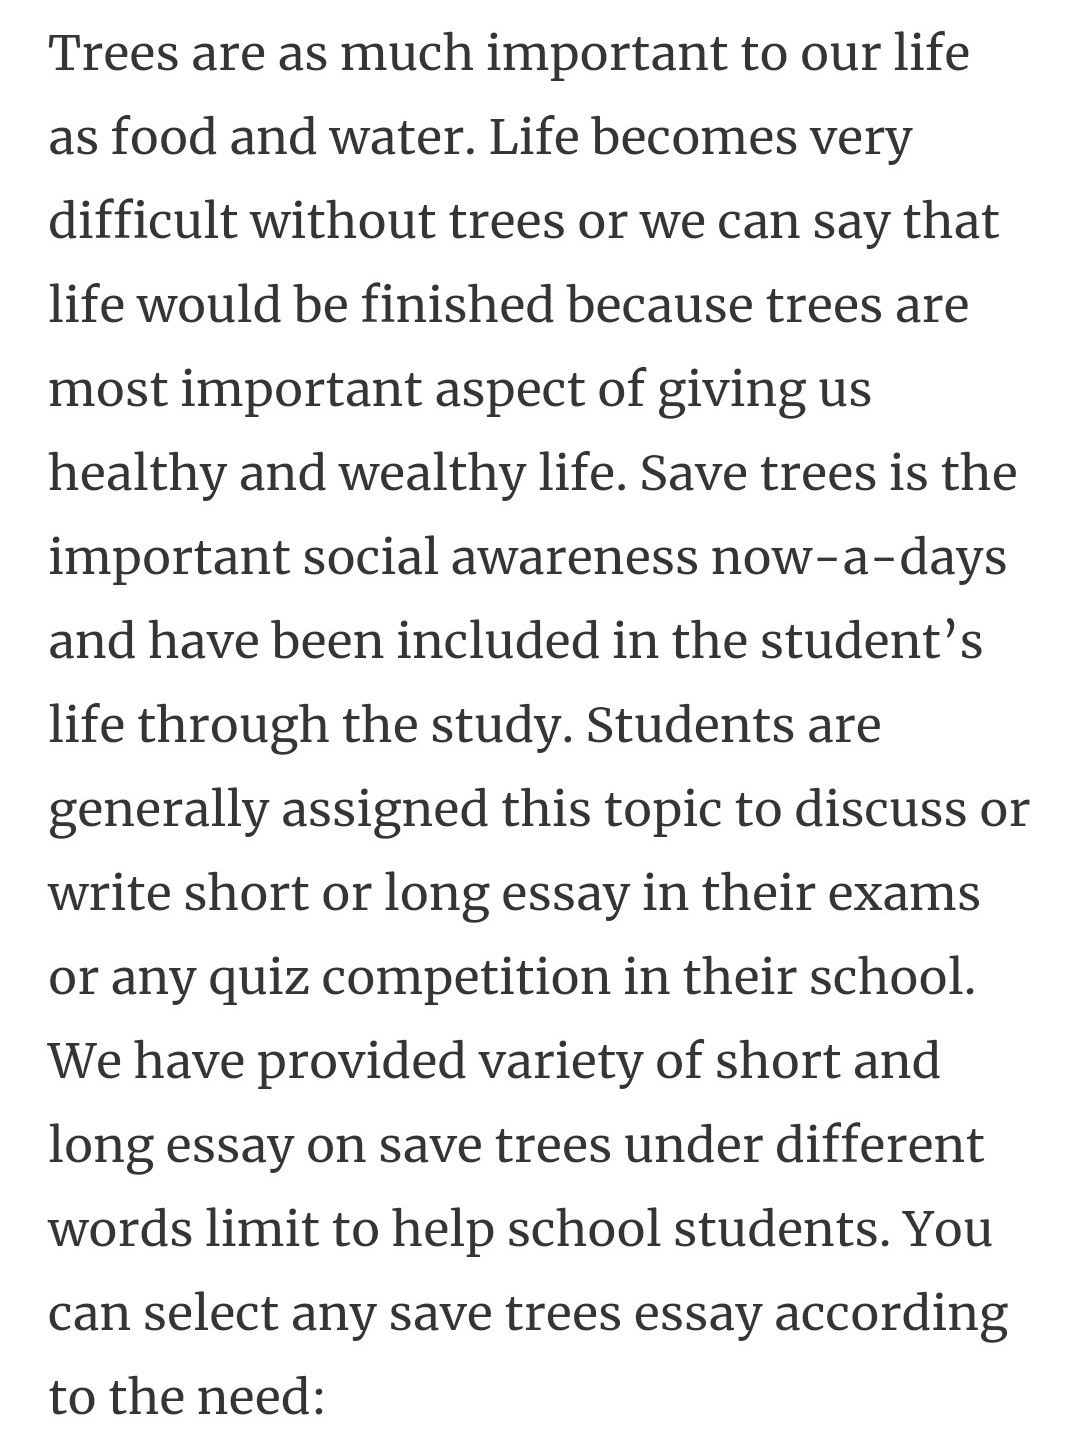 002 Tree Essay Example Unforgettable Neem In Sanskrit Kannada Hindi Full